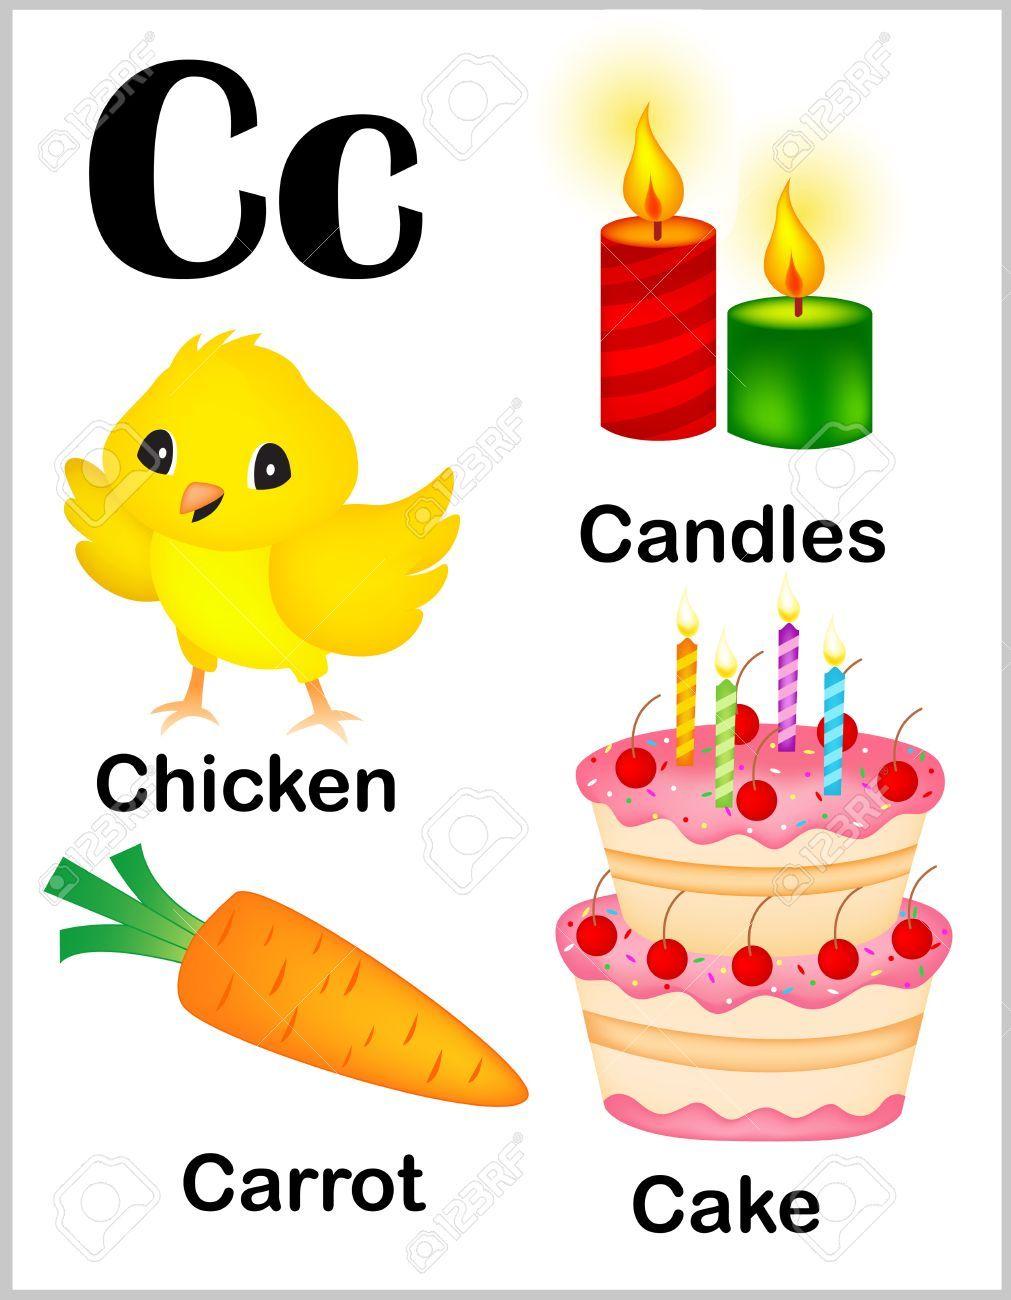 0f587784726d81a4a0765f5574eb91ae - Words That Start With B For Kindergarten